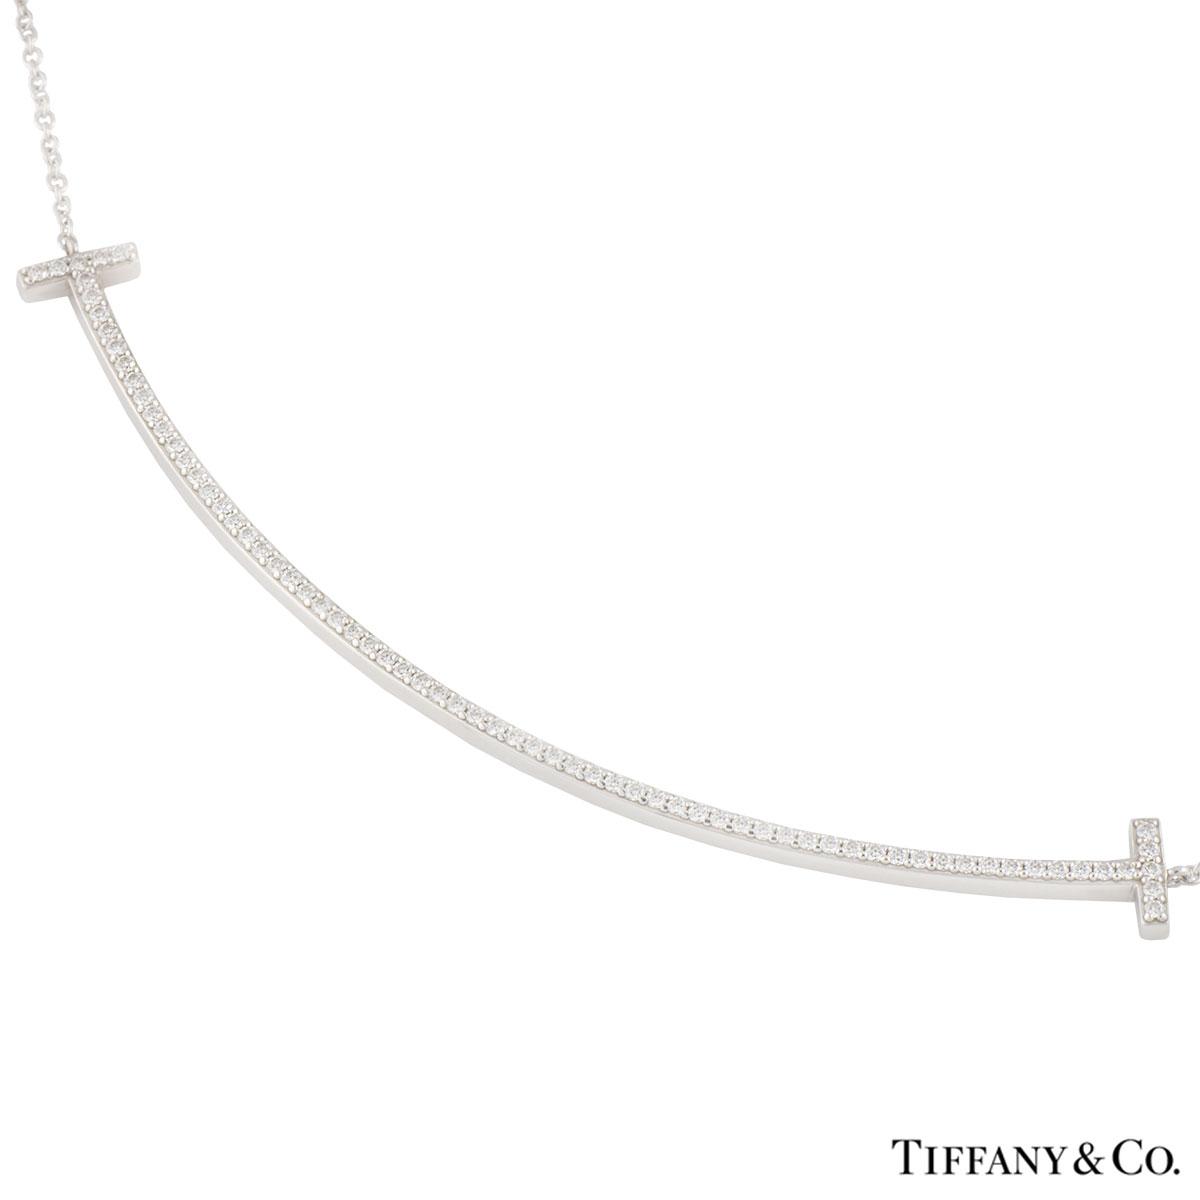 d46ba1494 White Gold Diamond T Smile Pendant · Tiffany & Co. White Gold Diamond T  Smile Pendant ...